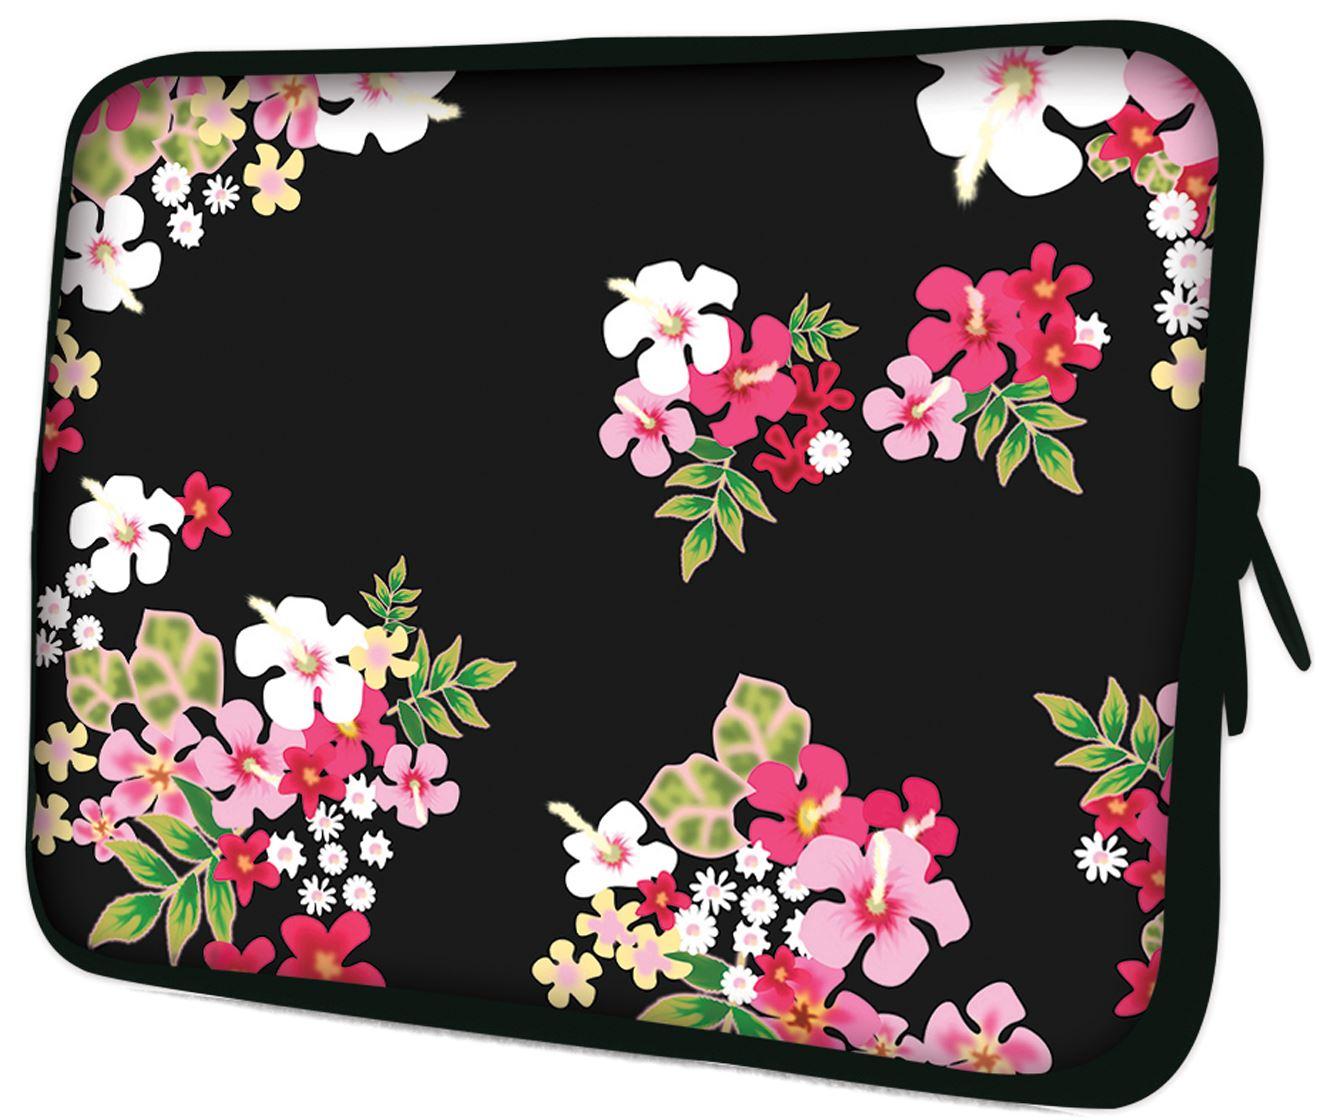 luxburg 7 9 zoll ipad mini aus neopren schutzh lle f r tablet 1 ebay. Black Bedroom Furniture Sets. Home Design Ideas